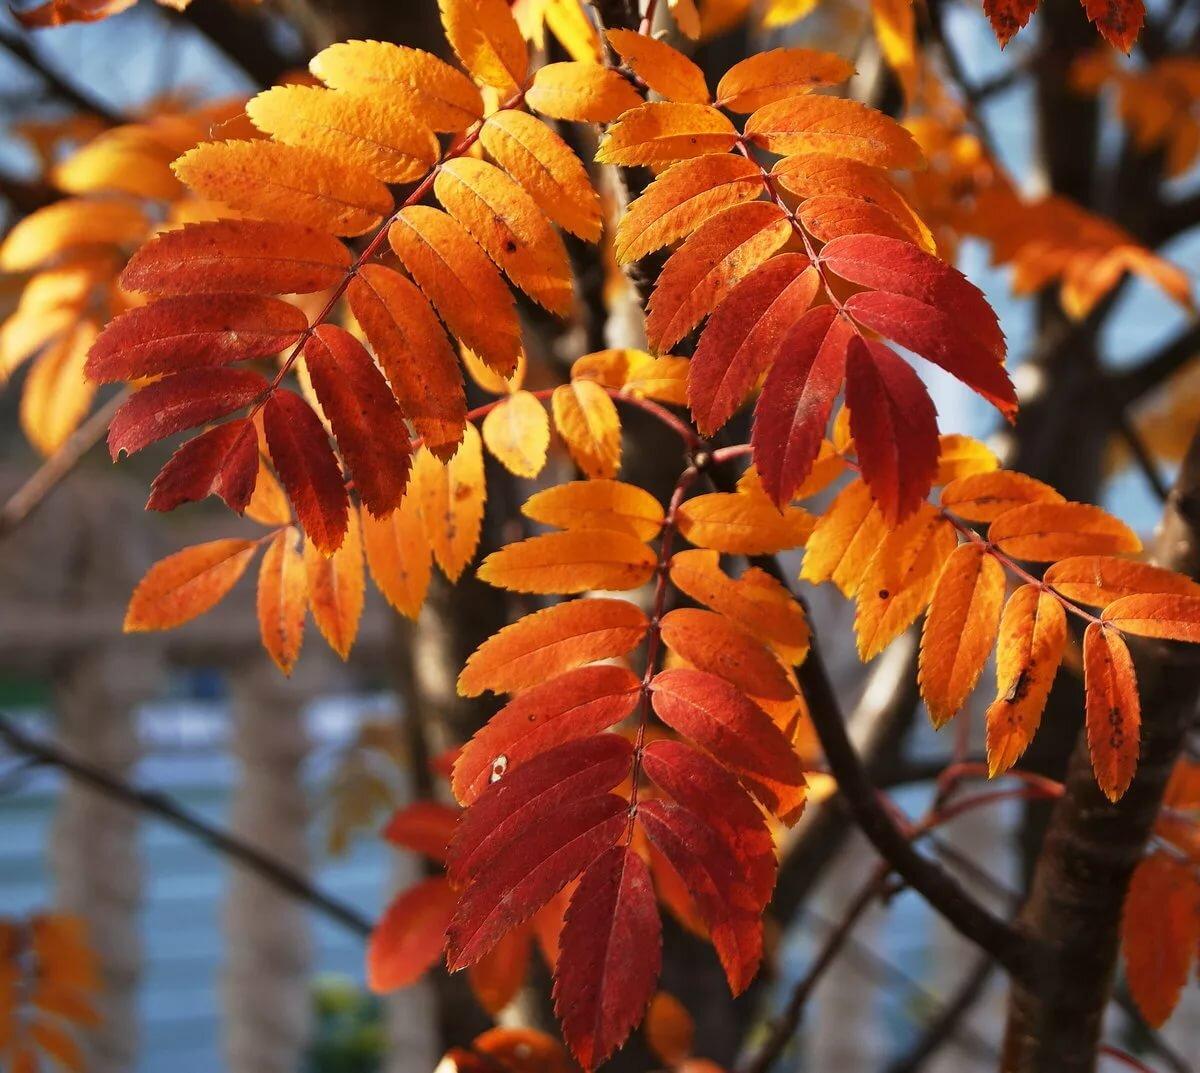 картинки осенняя листва рябина мне